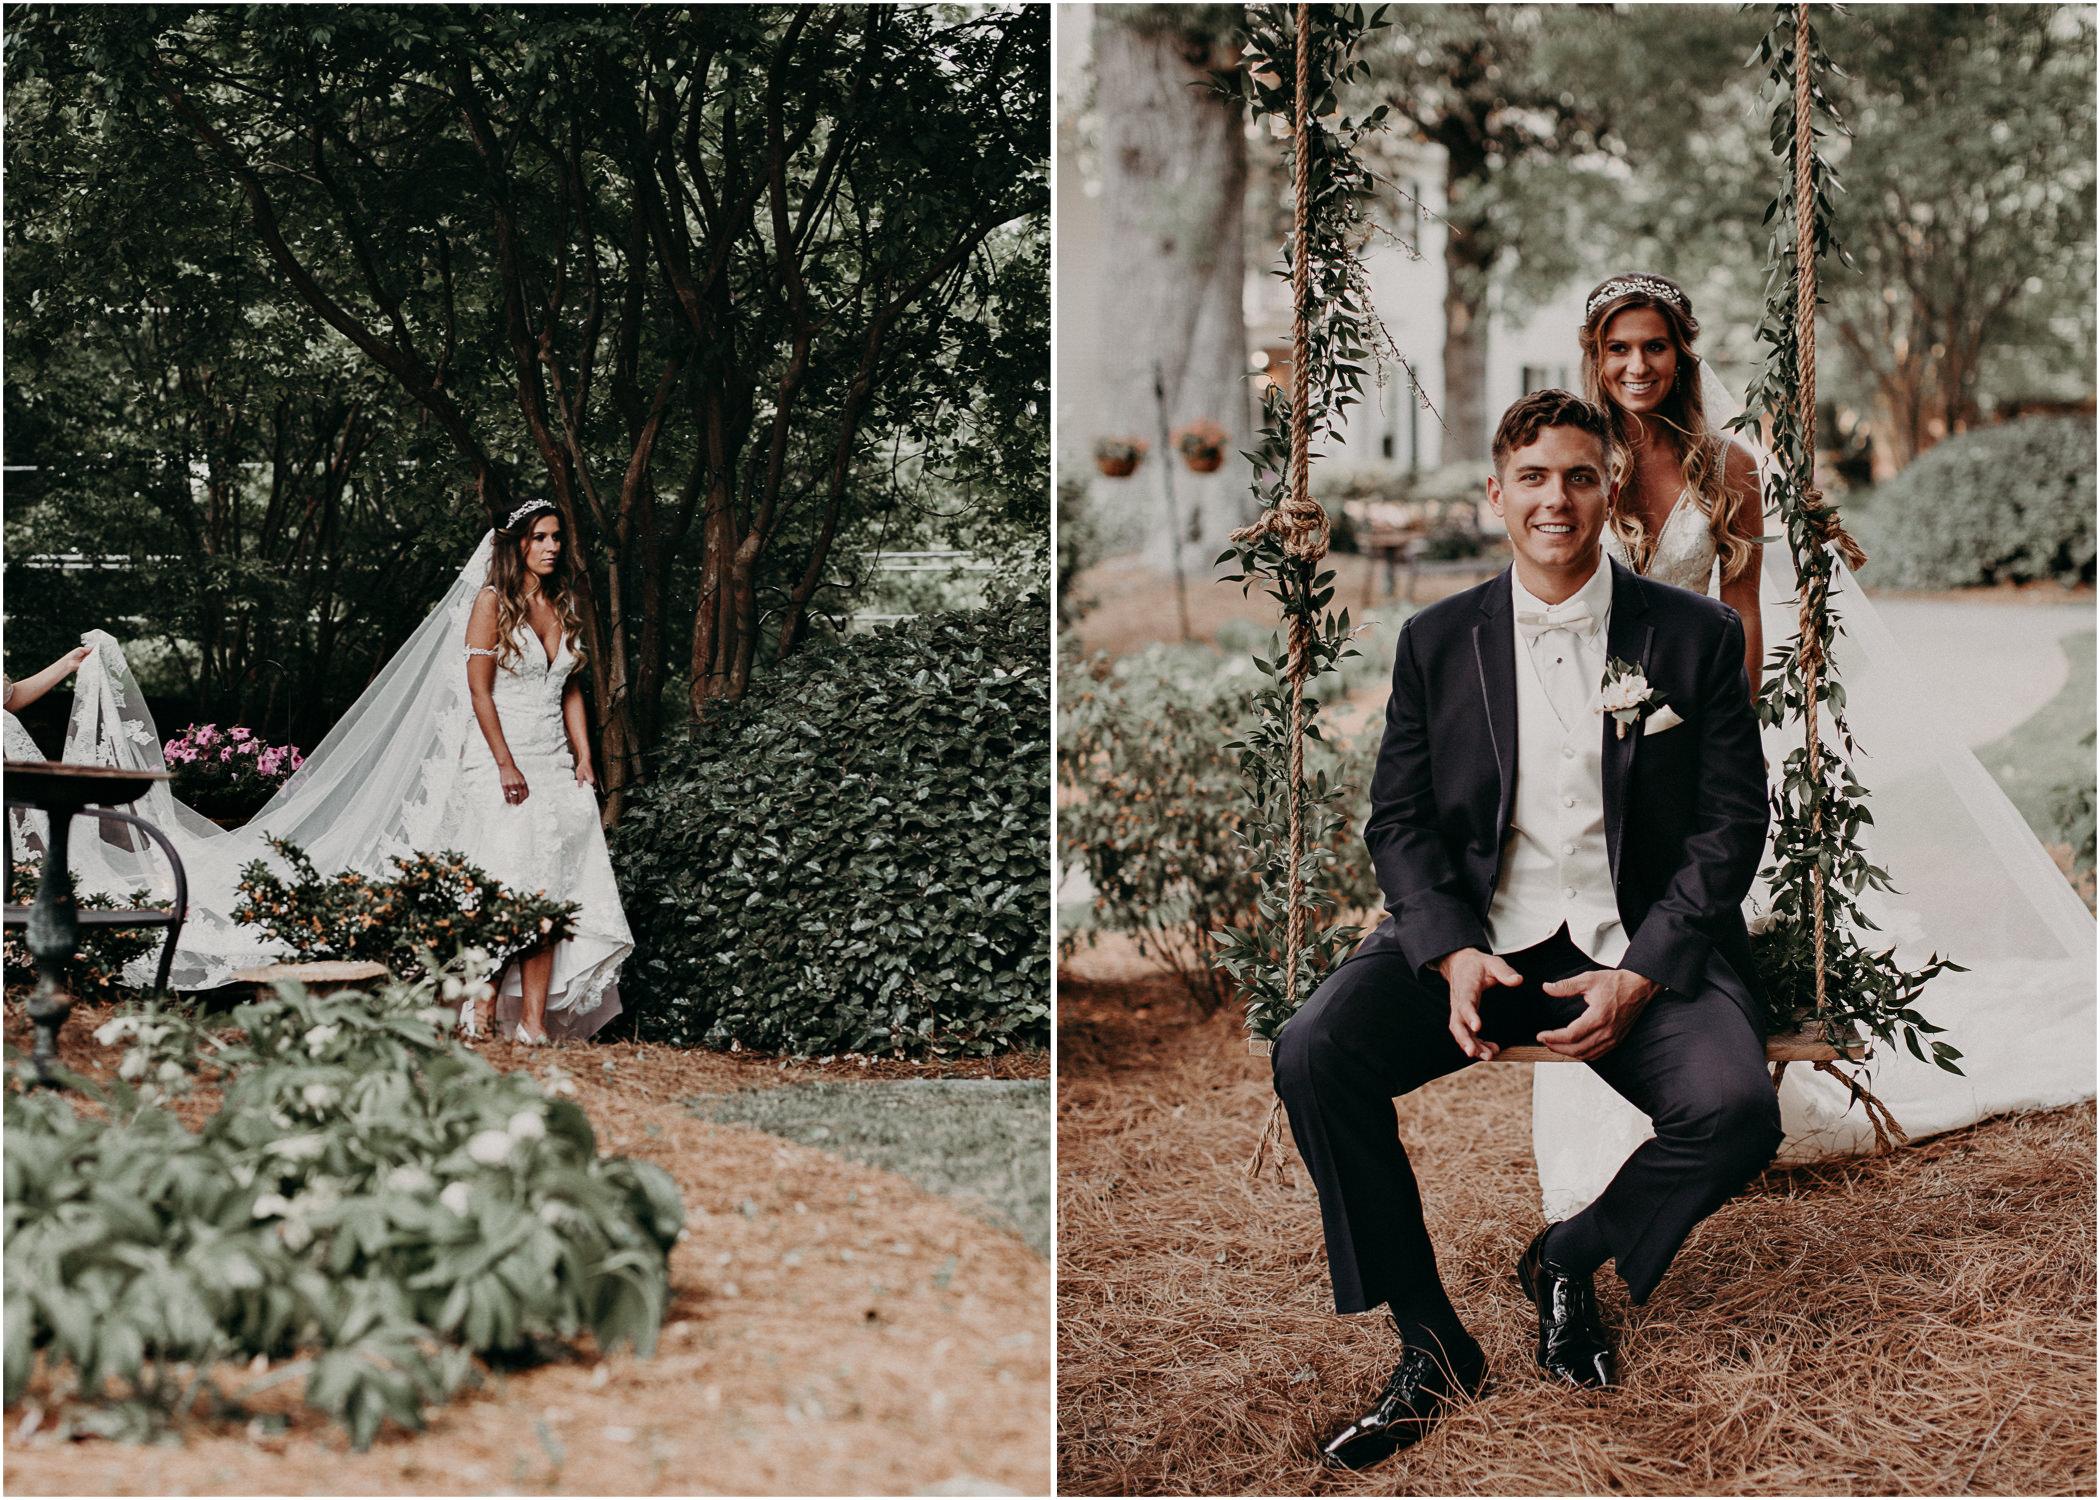 33Carl House Wedding Venue Ga, Atlanta Wedding Photographer - Boho, Bohemian, Junebug Weddings, Vintage, Retro, Trendy. Aline Marin Photography. .jpg